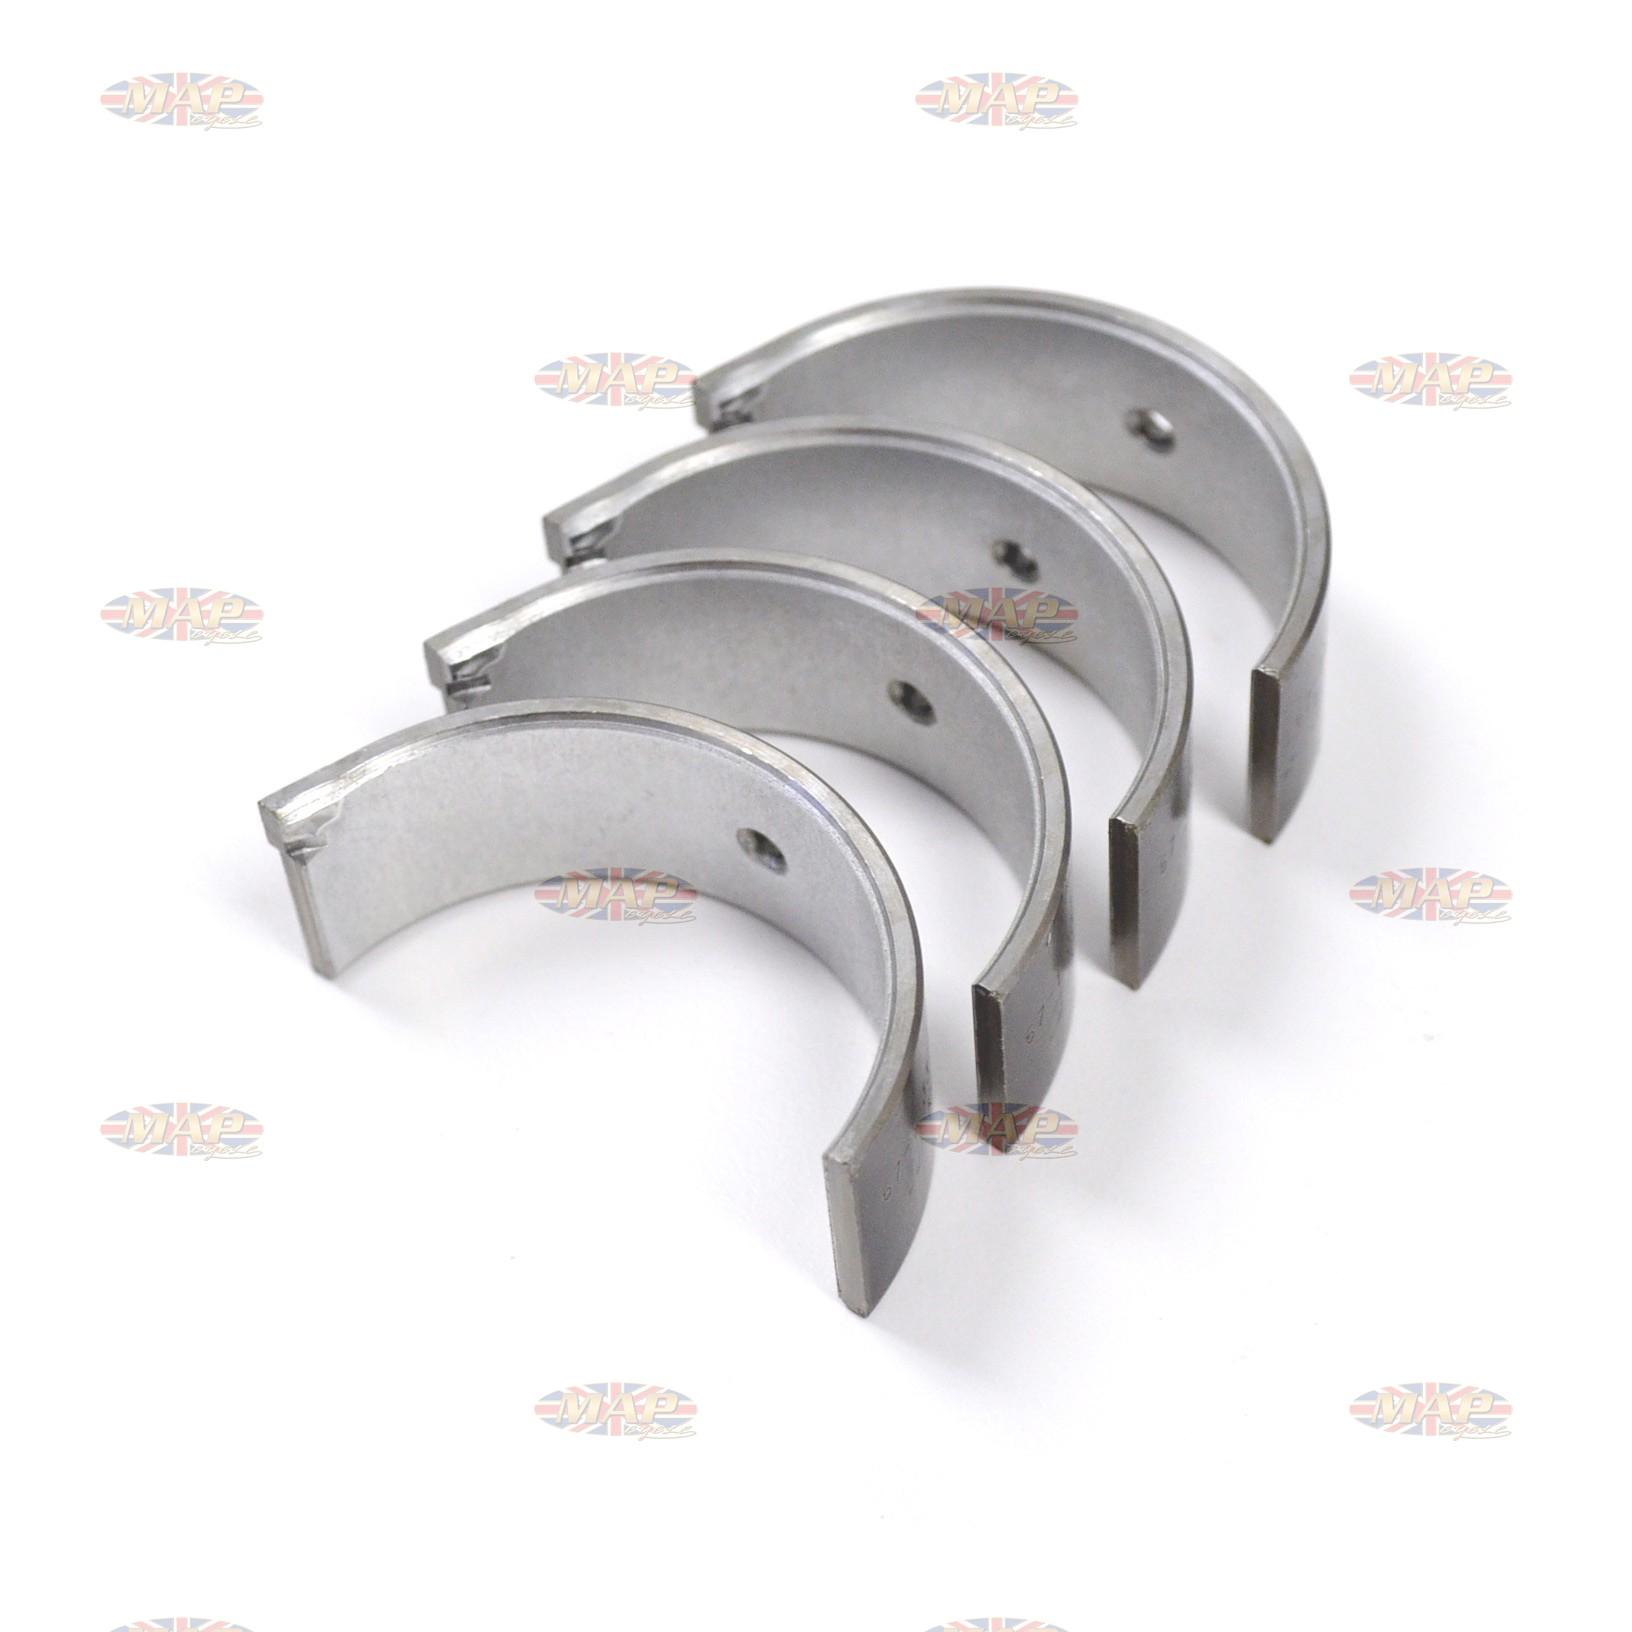 ROD BEARING/ BSA II w/1.687 PIN  STD USA B2046M/A